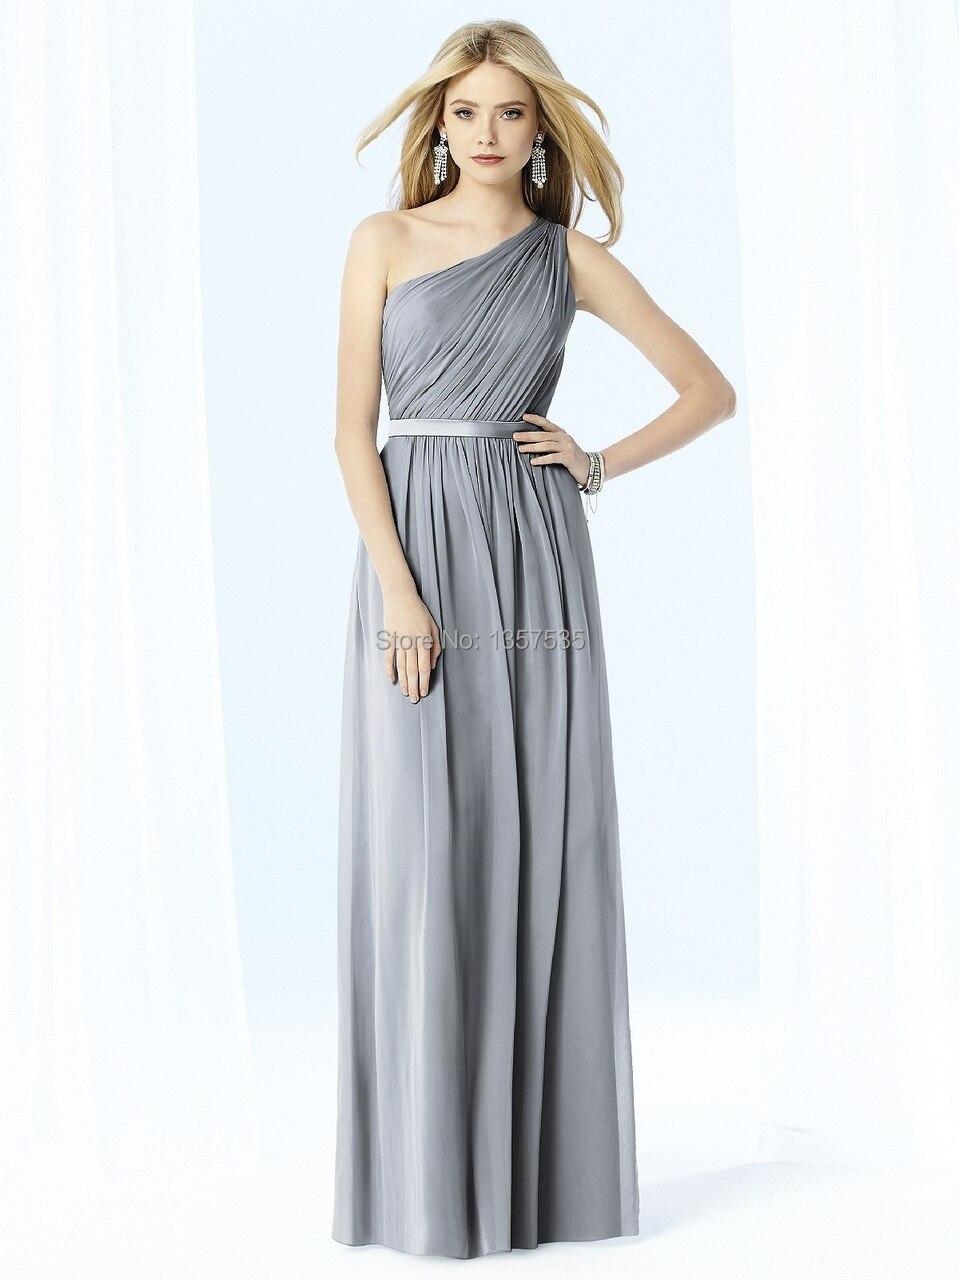 Silver chiffon long bridesmaid dresses fashion dresses silver chiffon long bridesmaid dresses ombrellifo Image collections